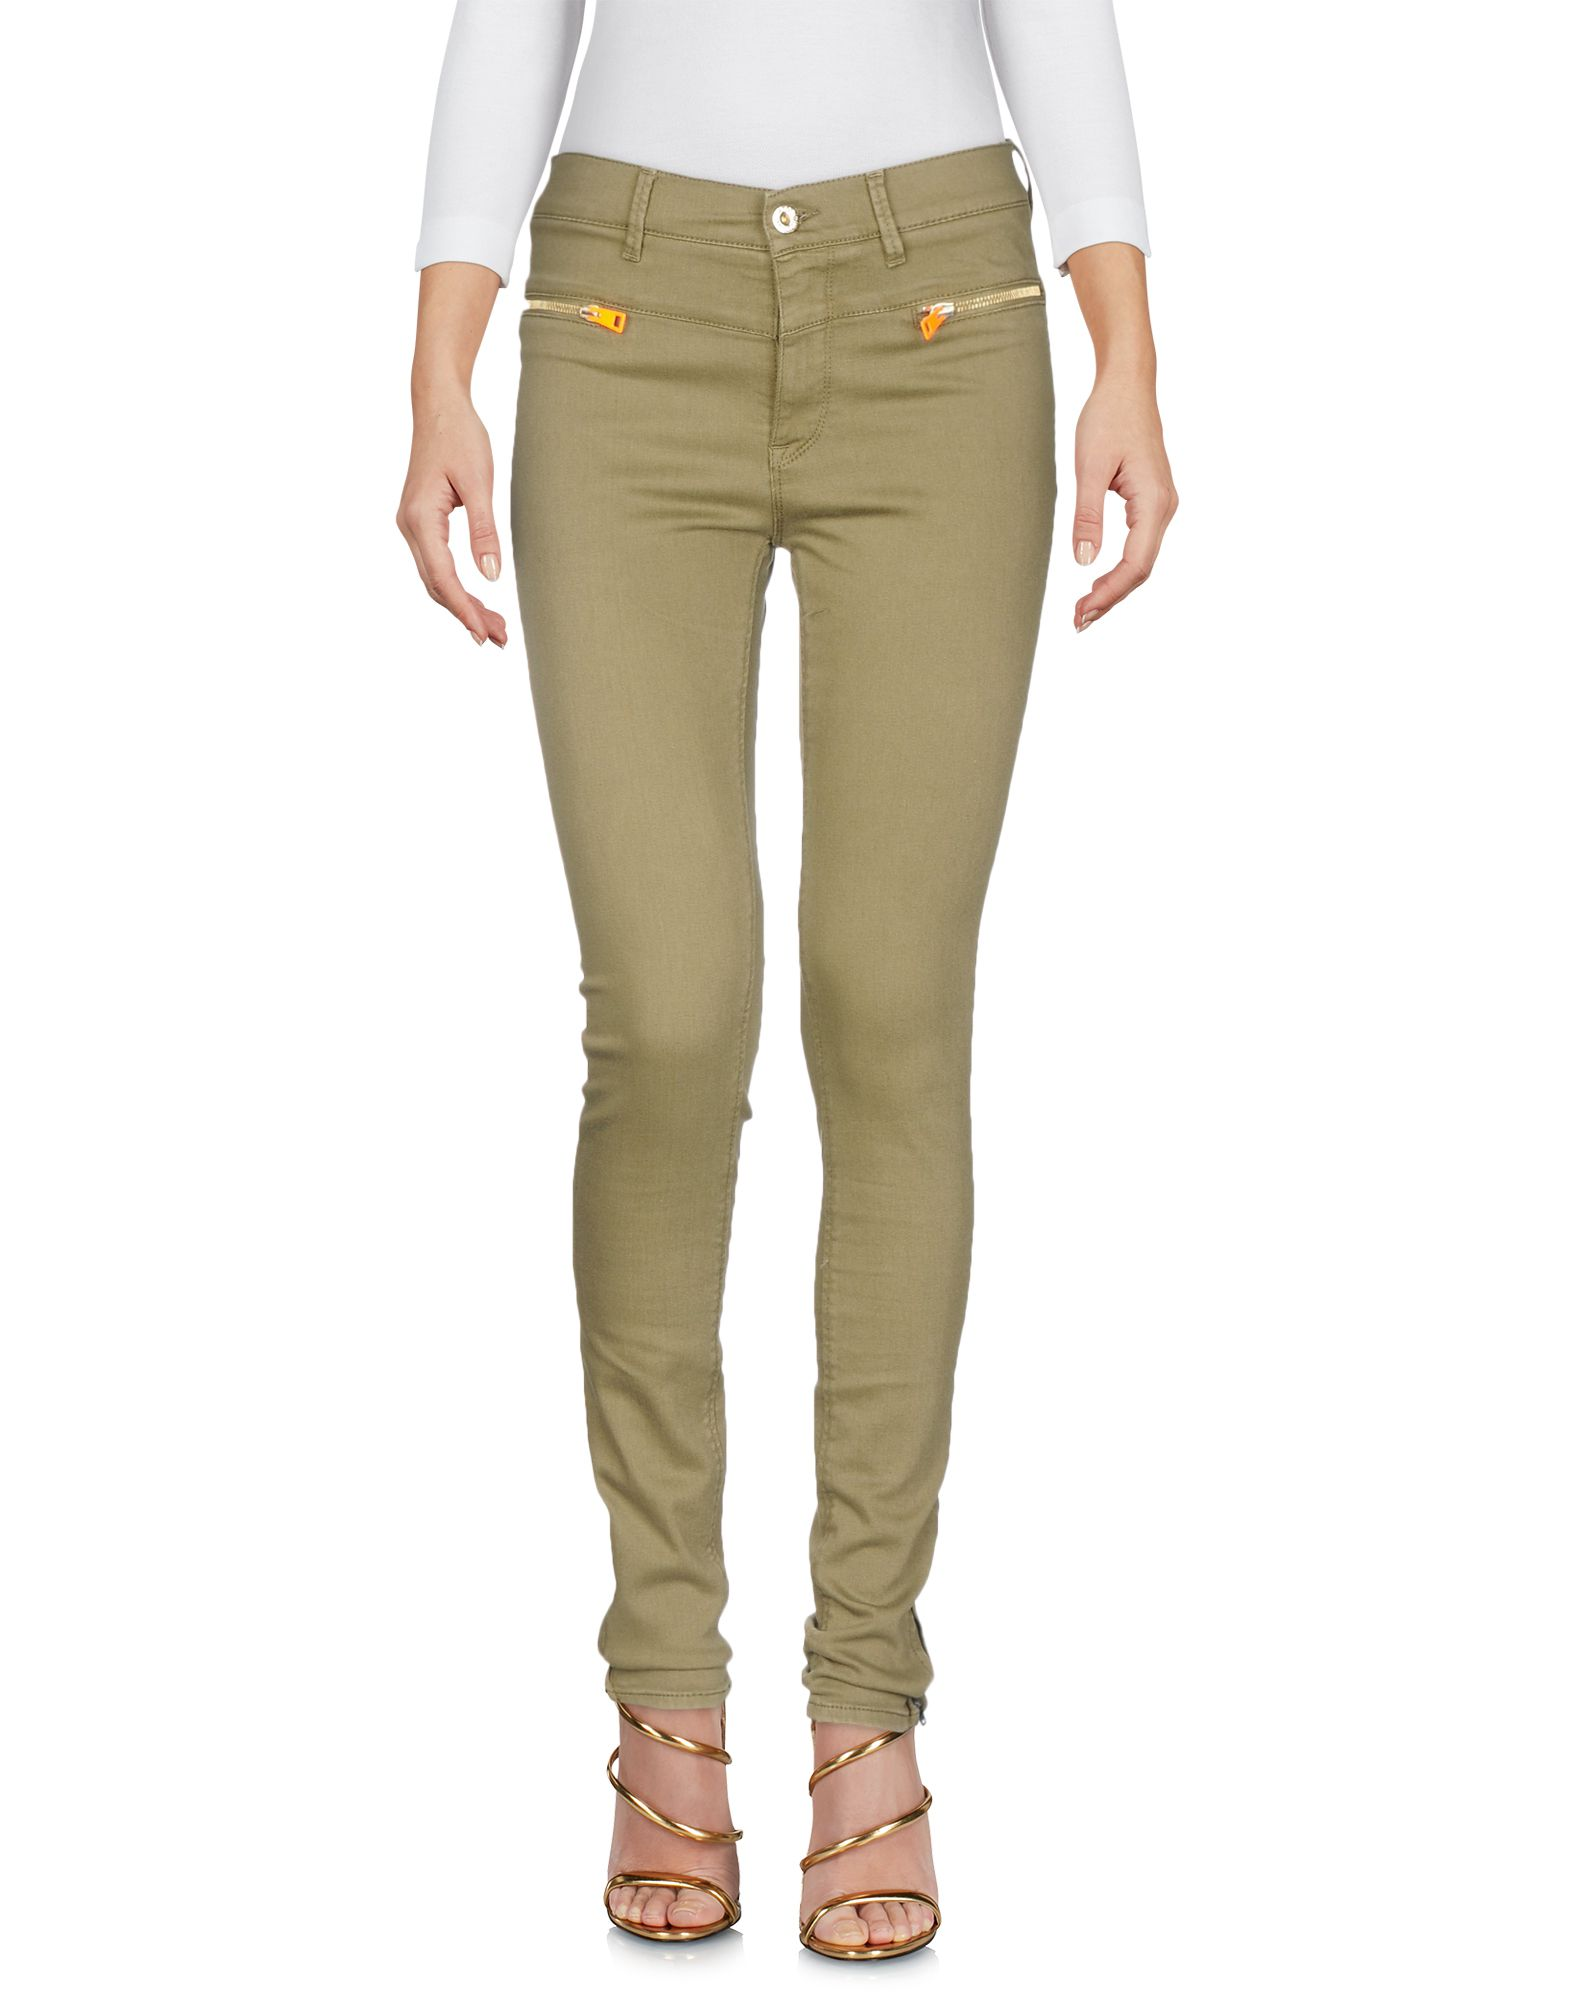 Pantaloni Jeans Atos Lombardini Donna - Acquista online su Xz3CufJ